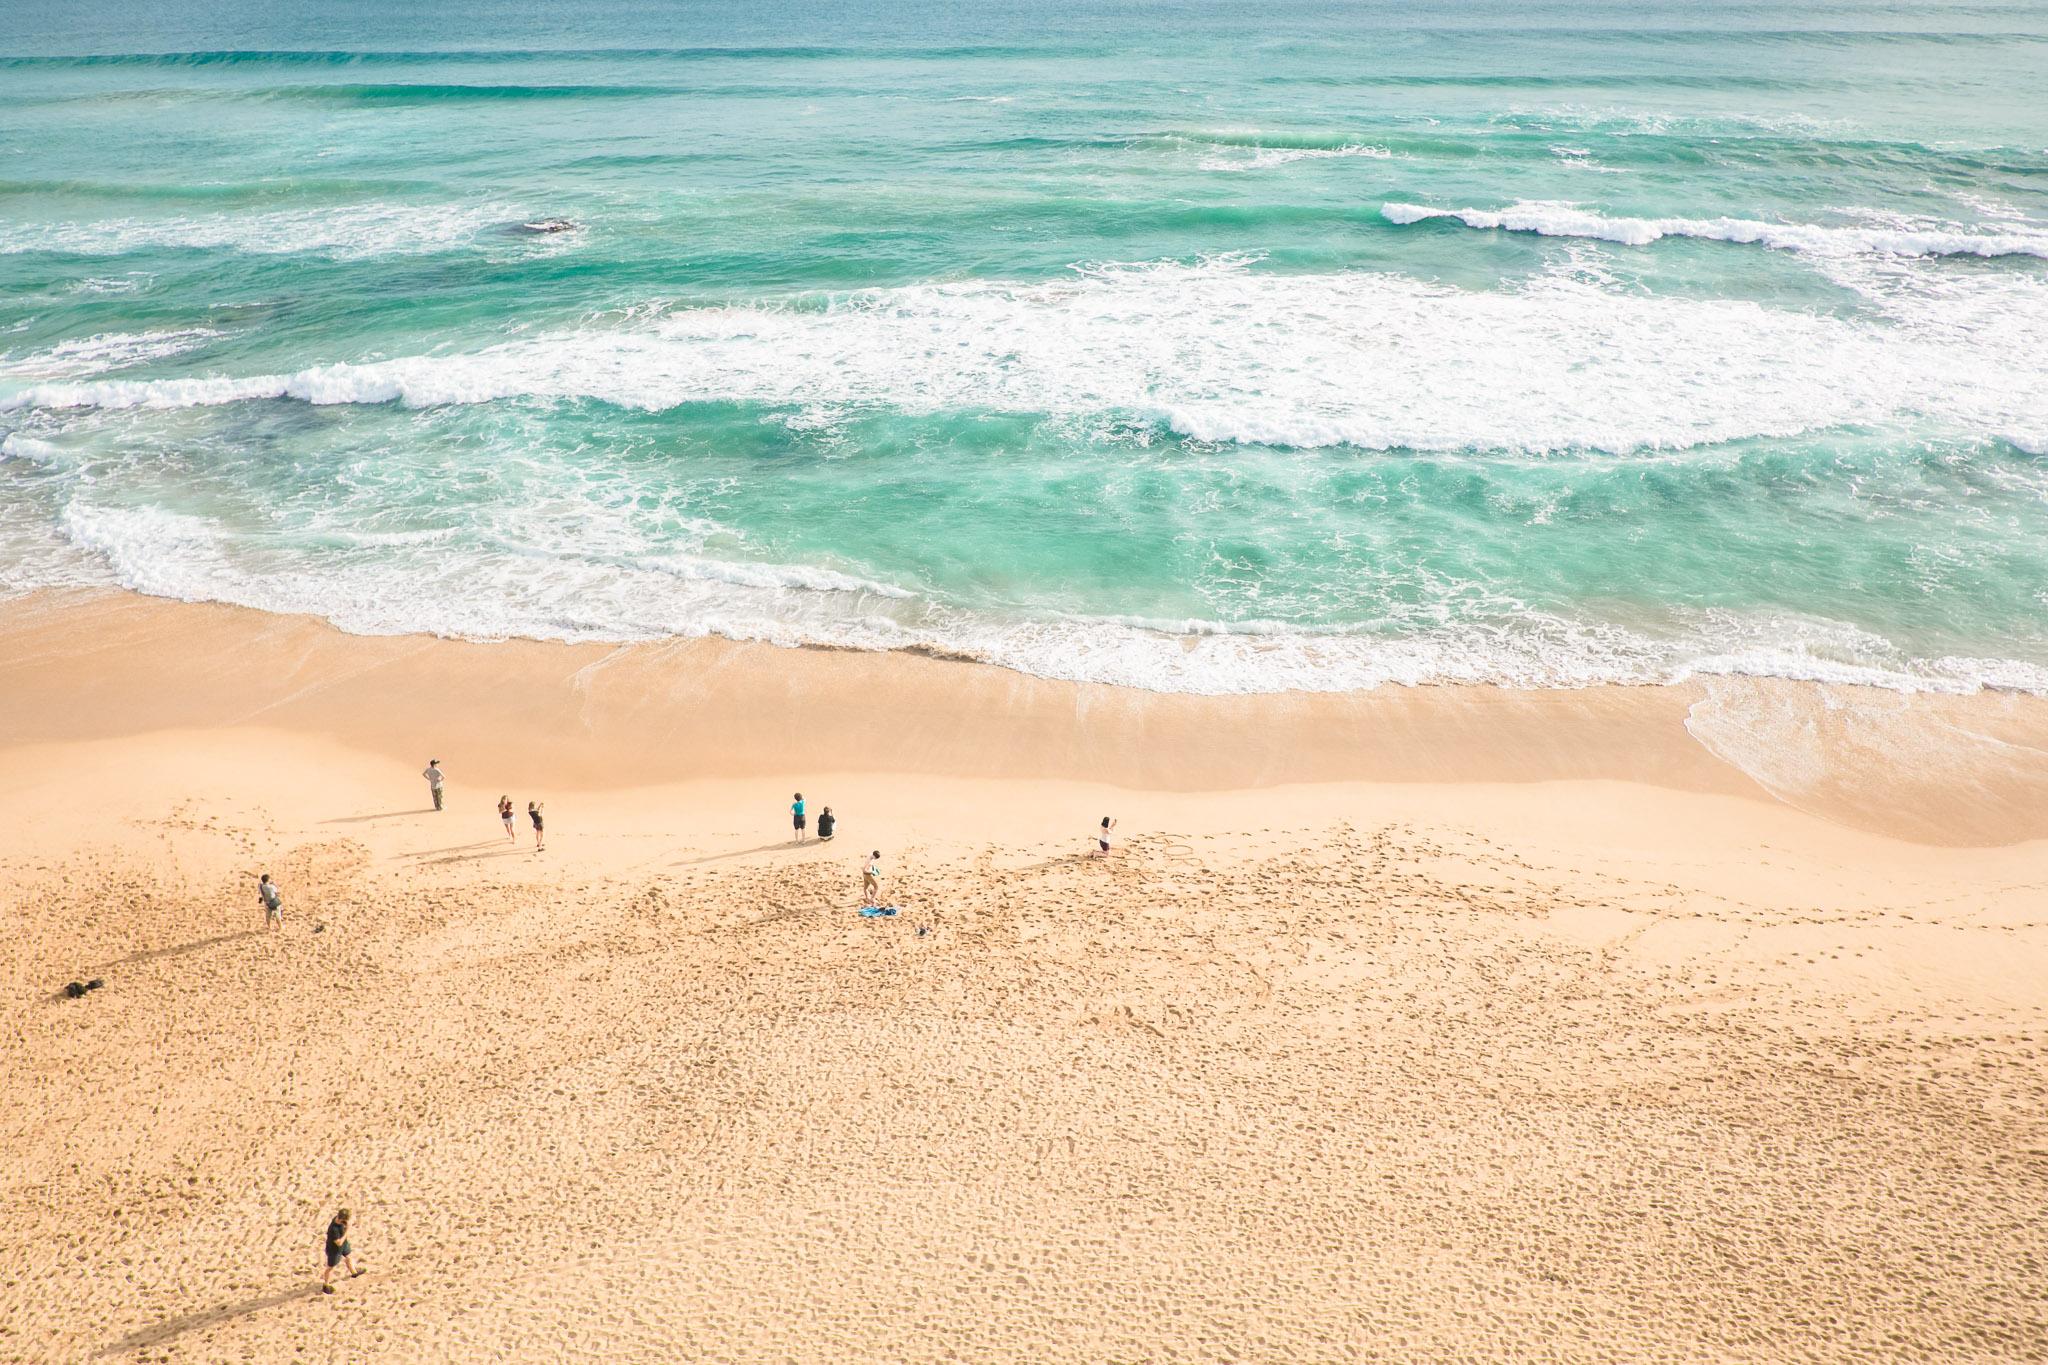 australia-great-ocean-road-7.jpg